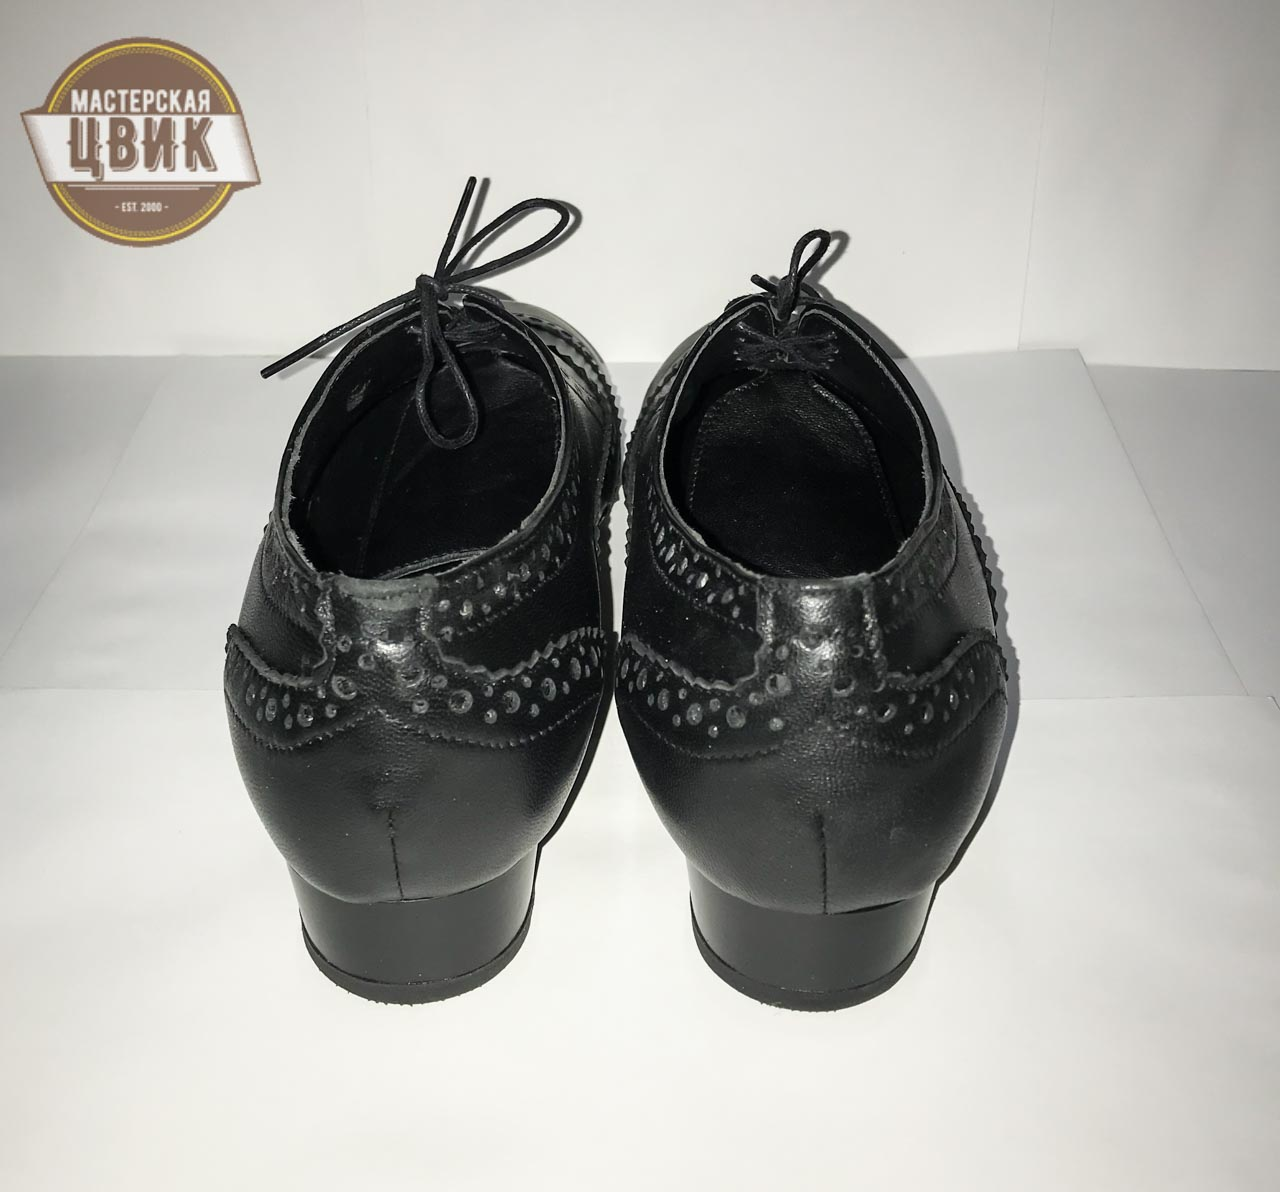 individualnyj-poshiv-obuvi-minsk-10 Индивидуальный пошив обуви Минск-10